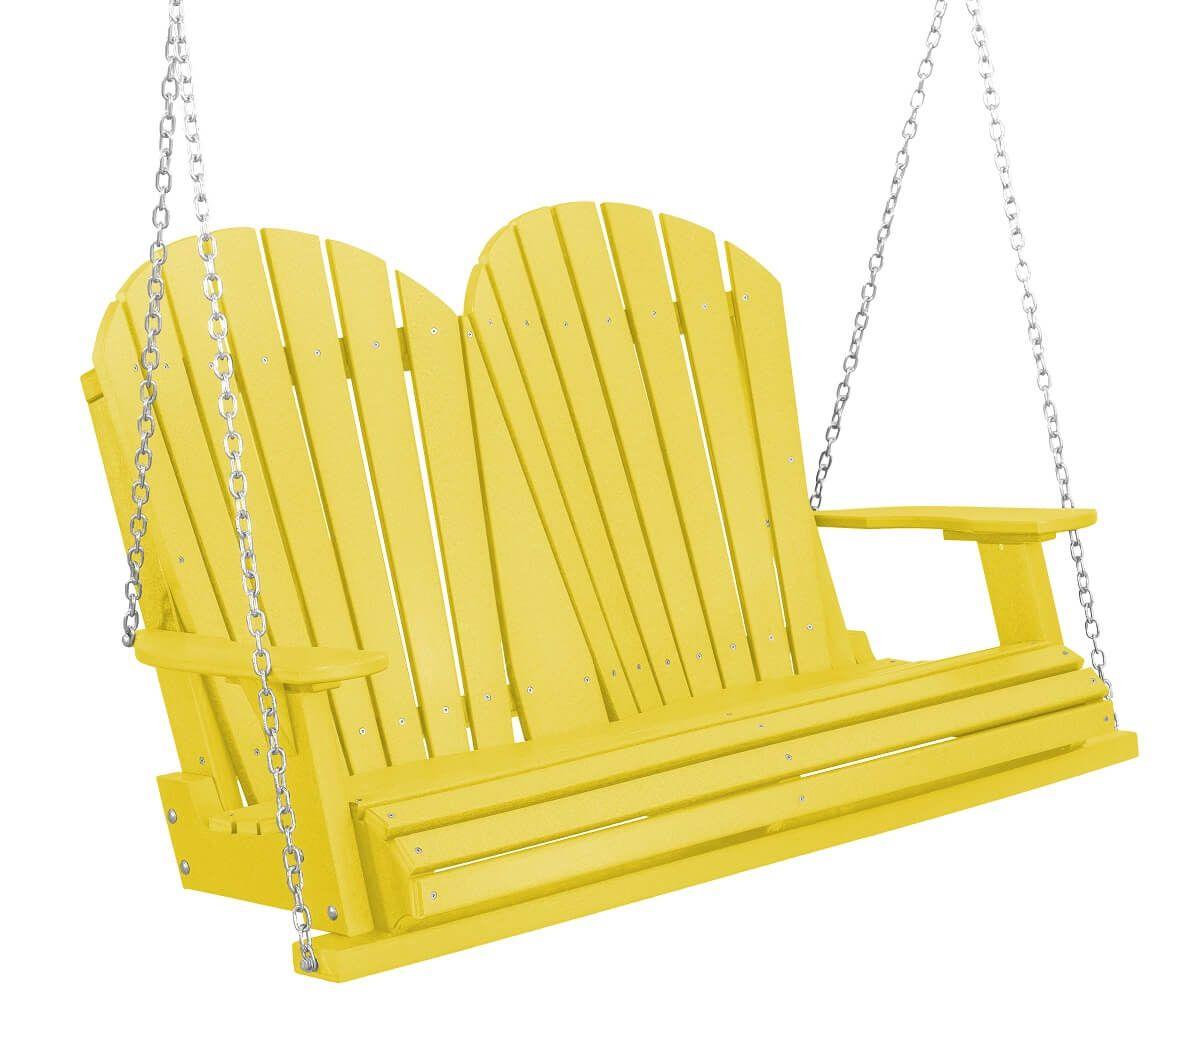 Lemon Yellow Sidra Outdoor Porch Swing